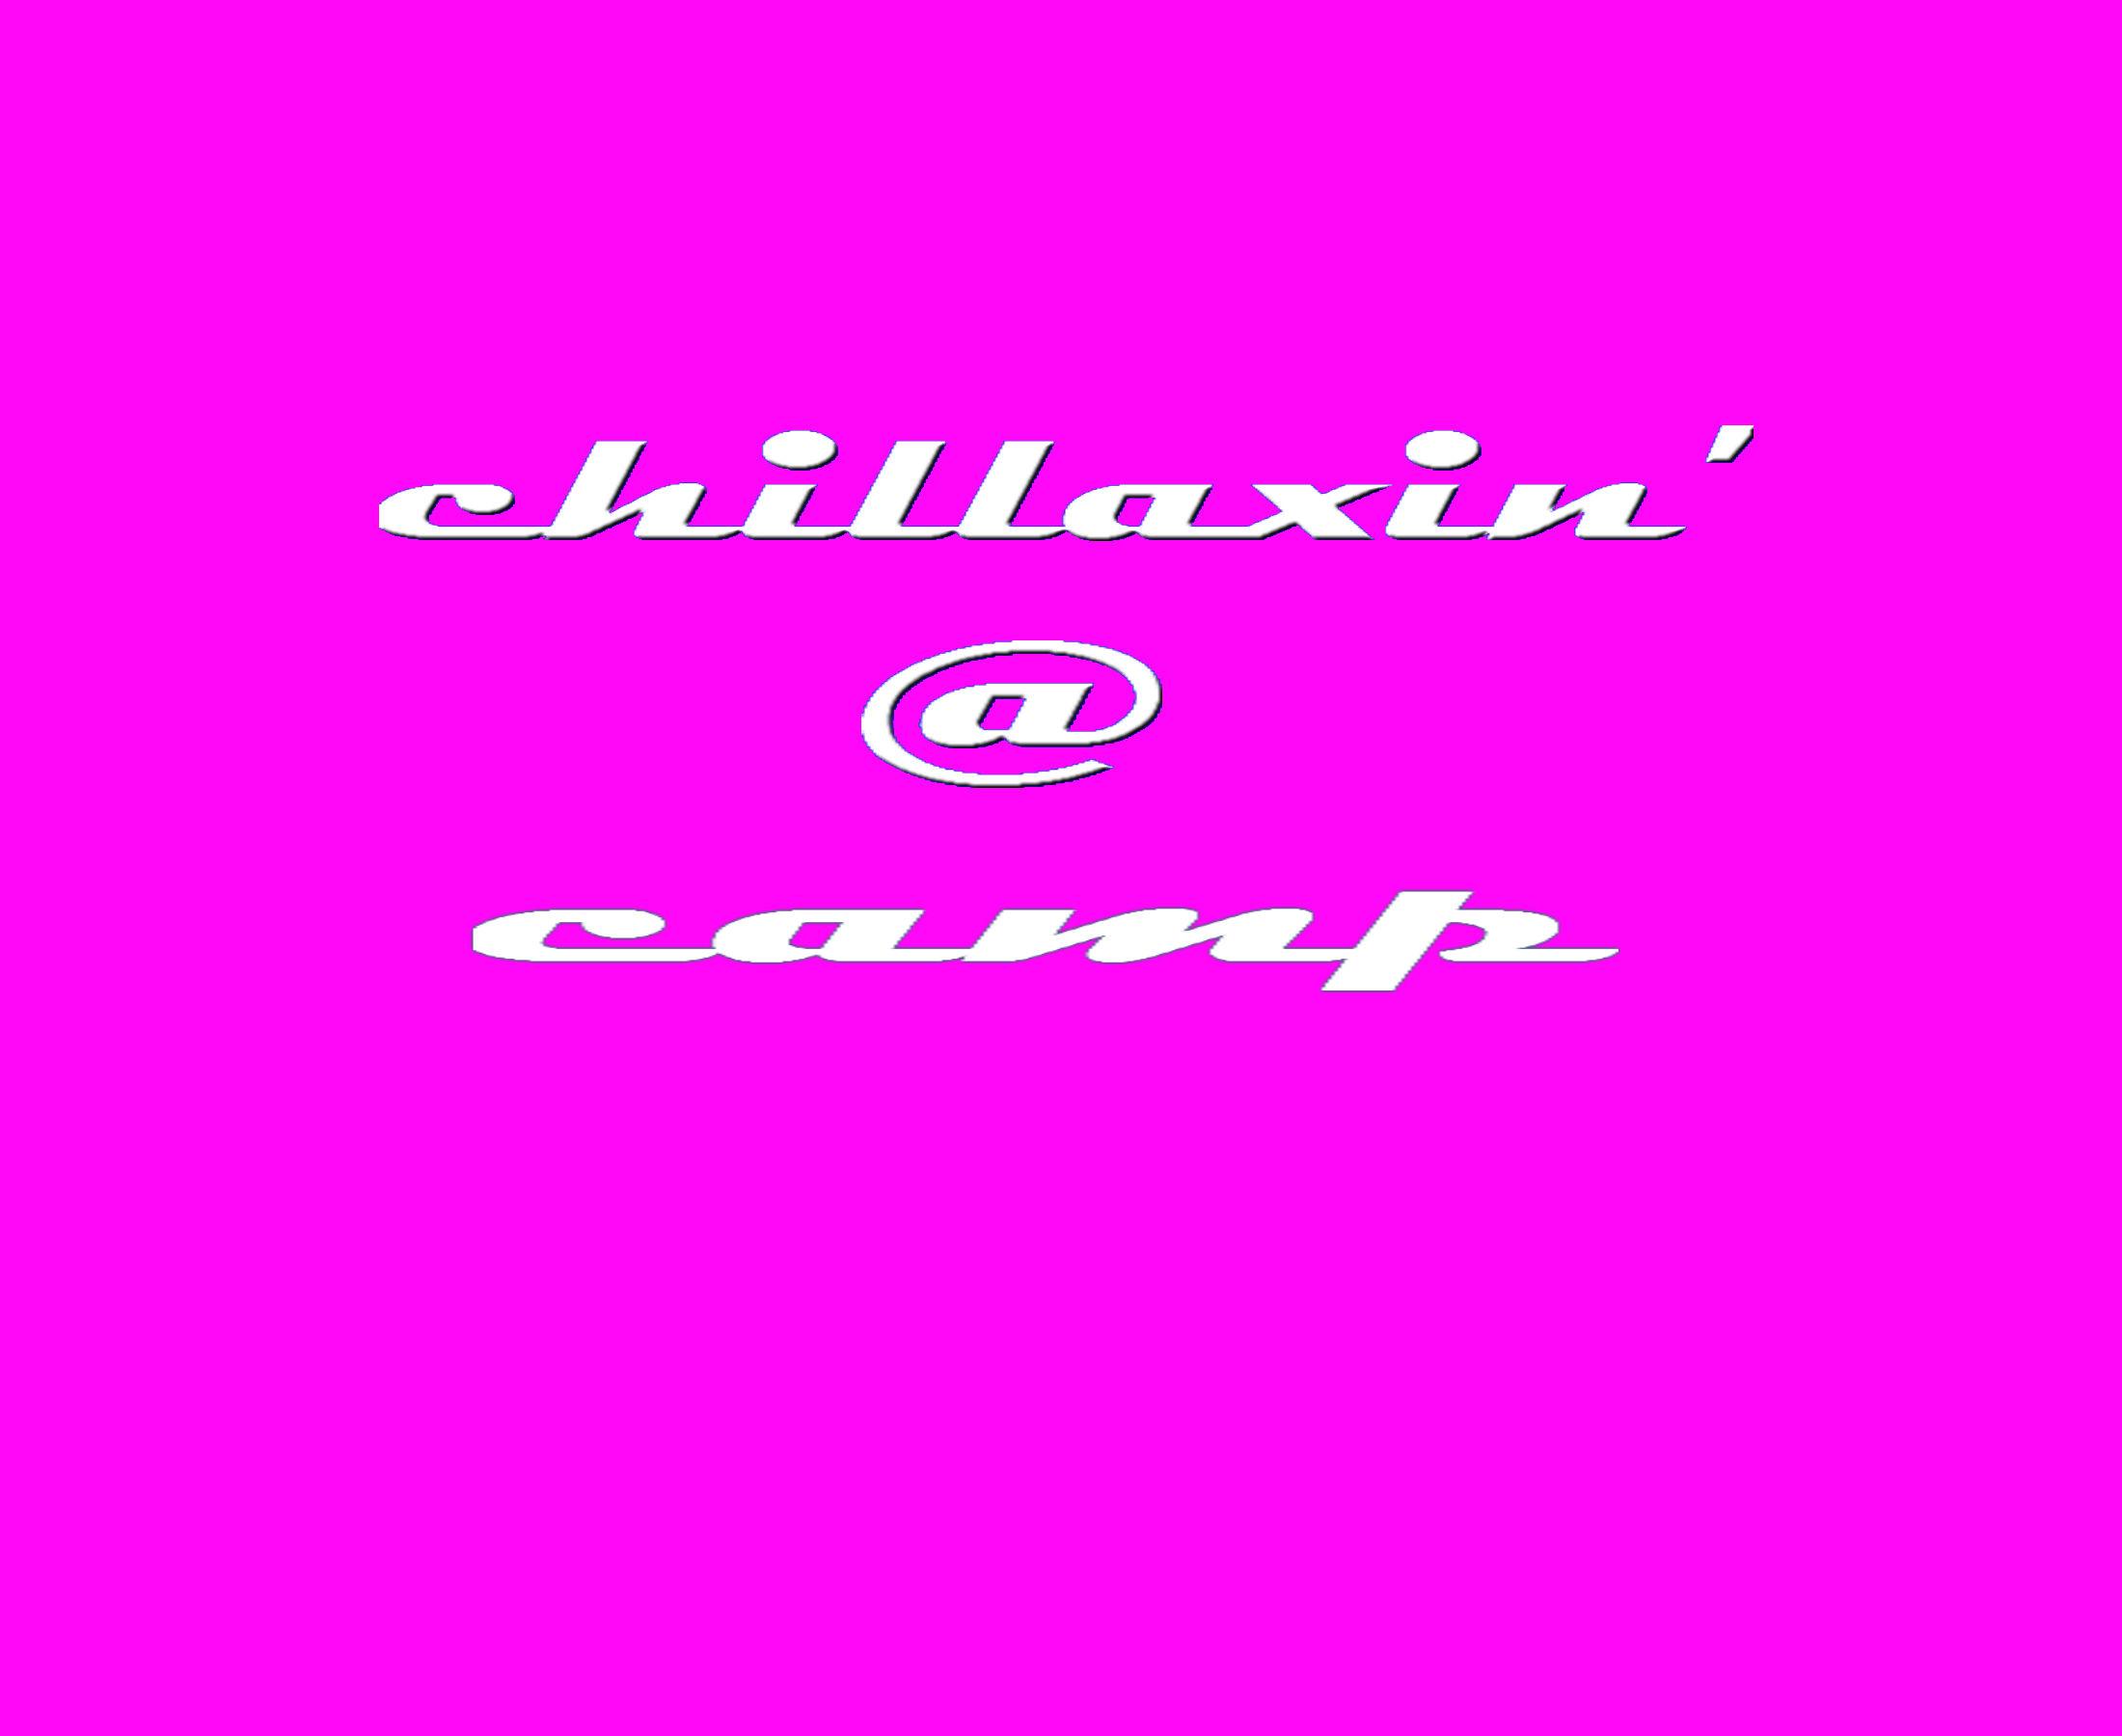 CHILLAXIN' AT  CAMP - pink